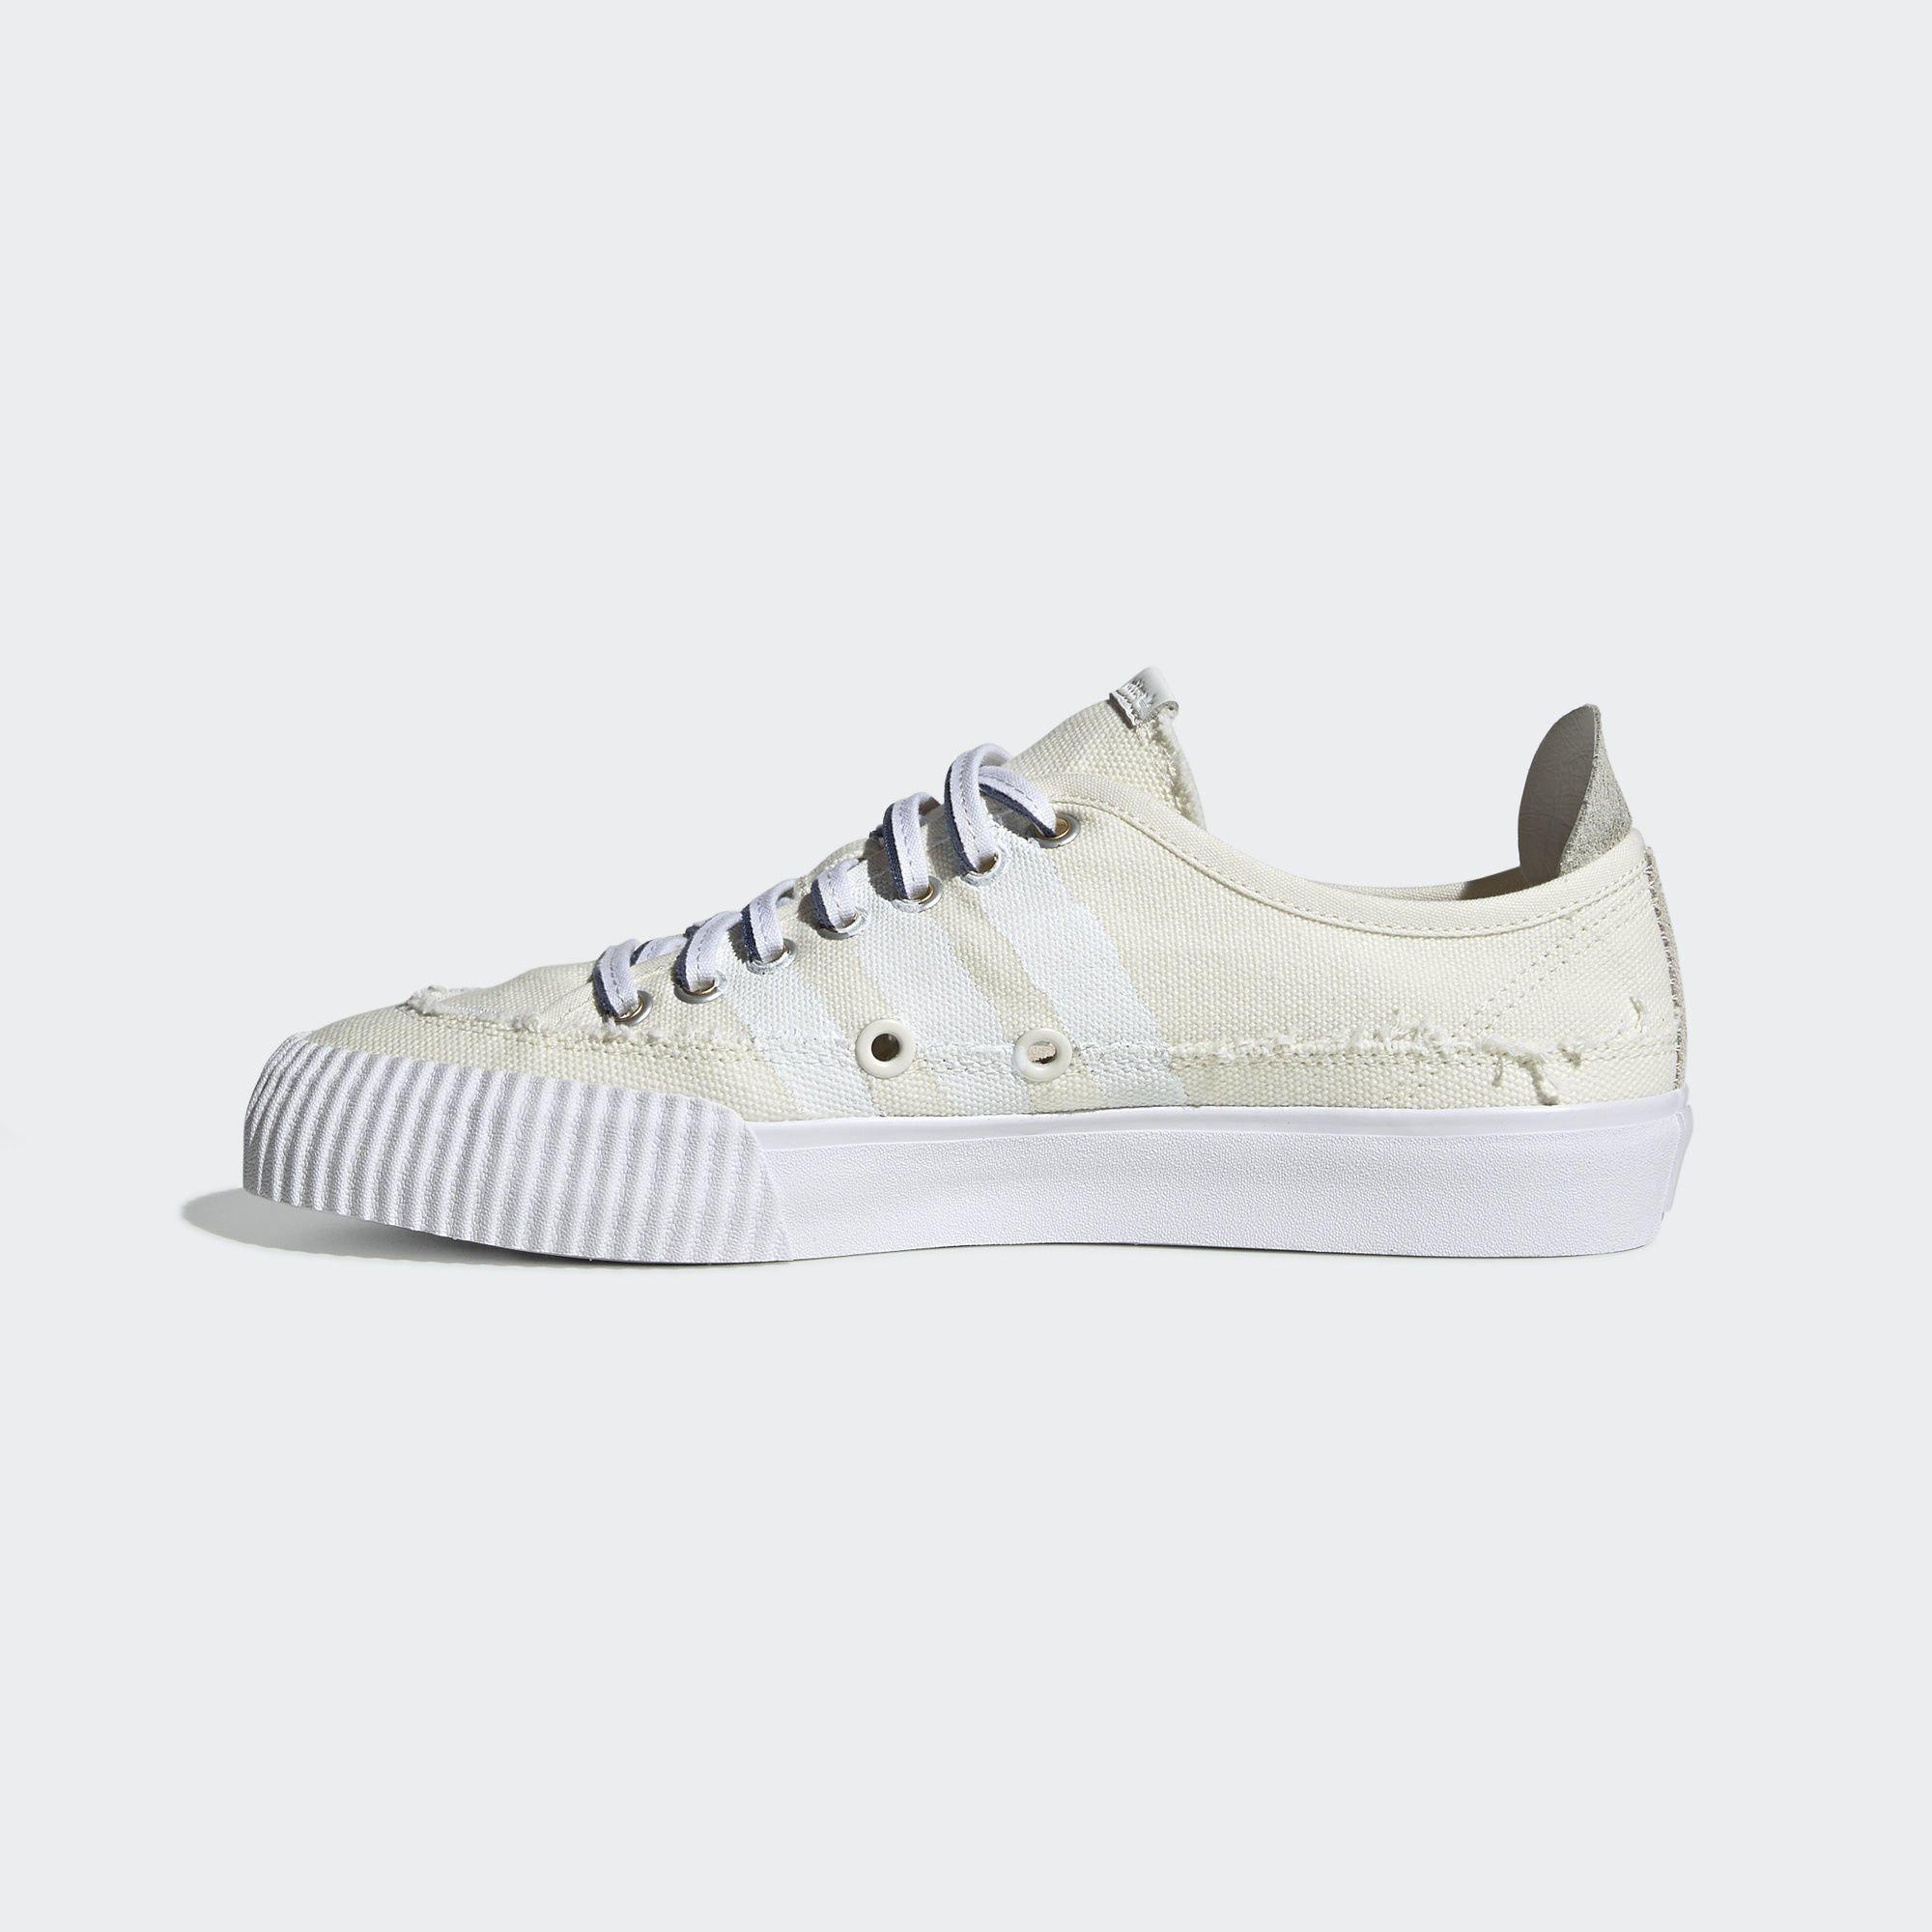 Adidas Nizza DG Off White / Ftwr White / Customized (EG1761)